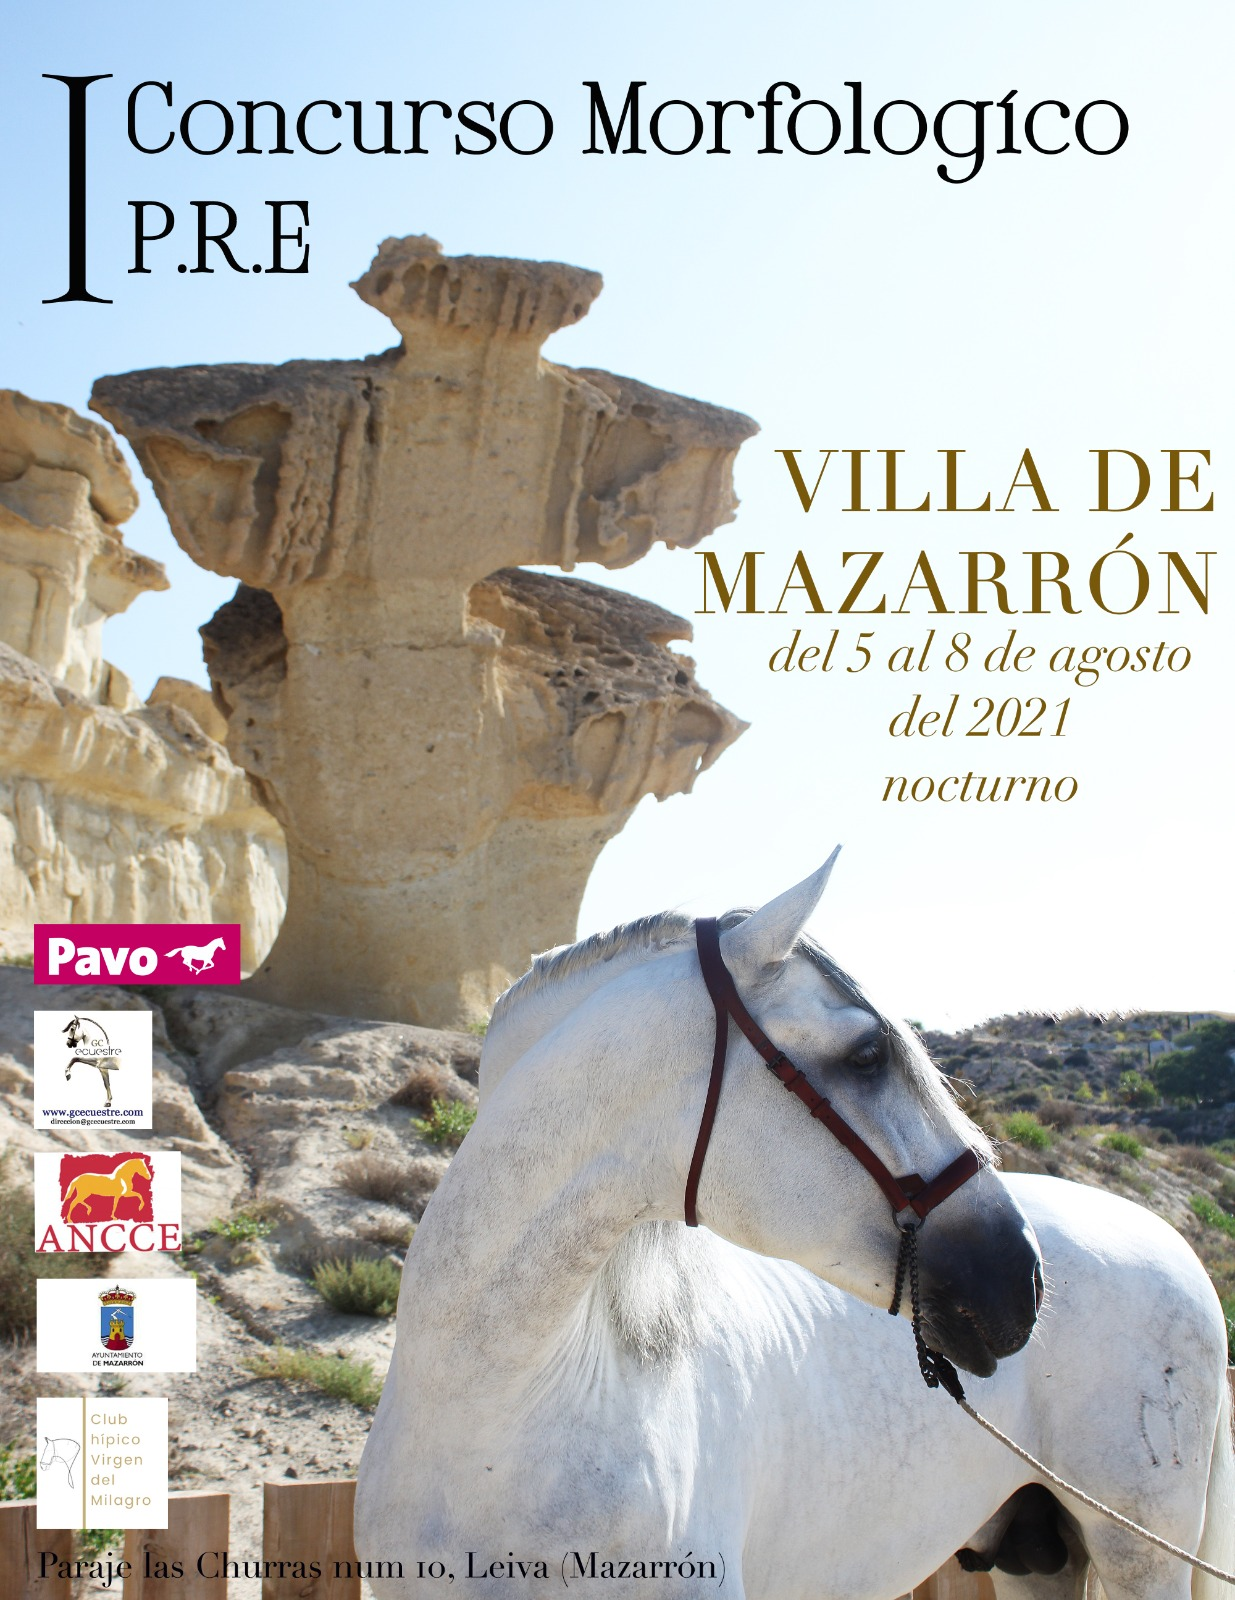 First Spanish Purebred Morphological Contest 'Villa de Mazarrón'